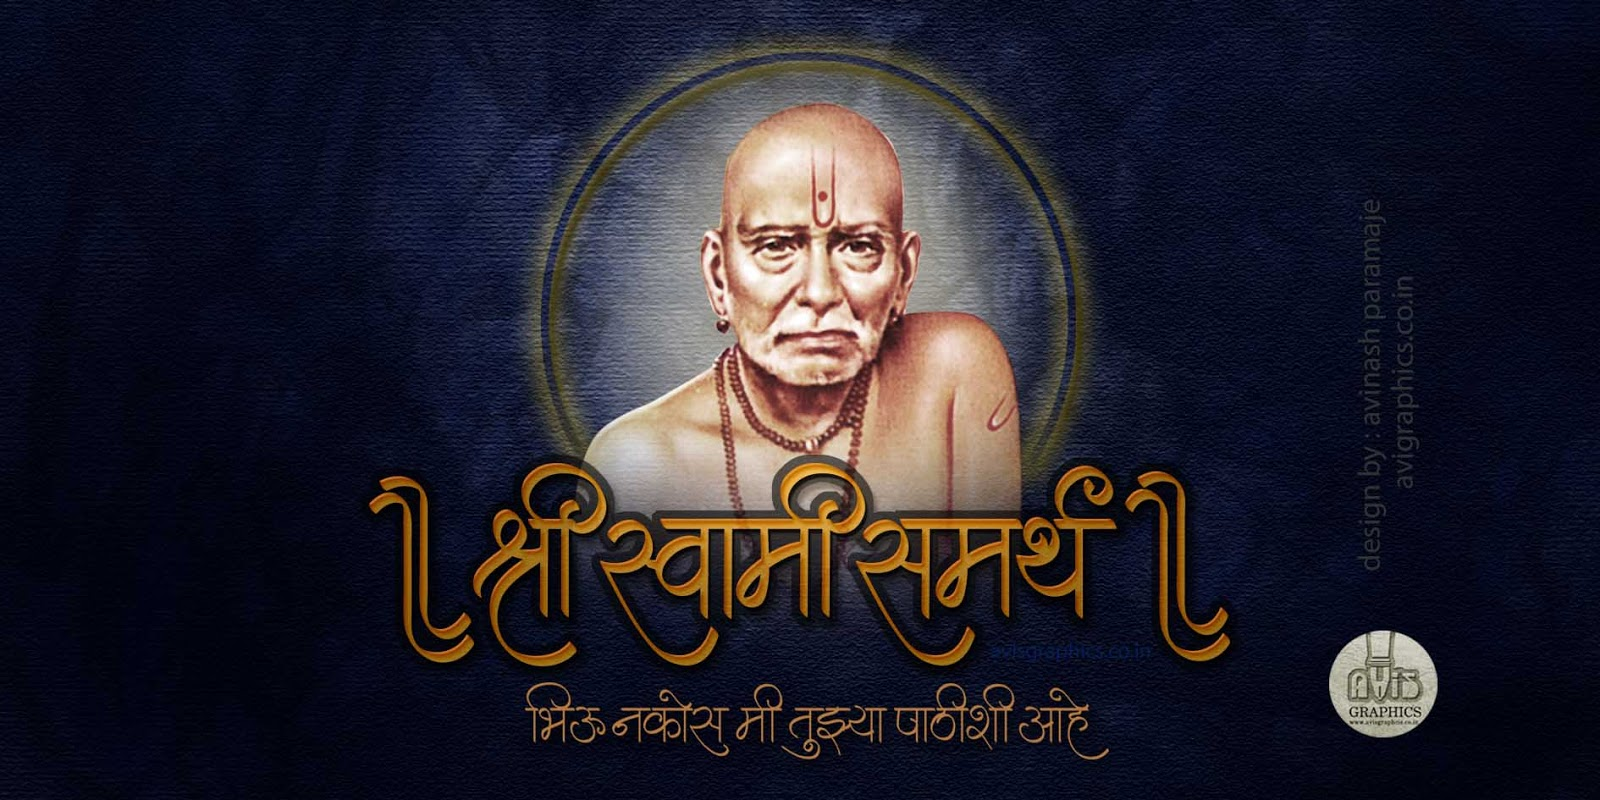 Sri Swami Samartha Full Hd Computer Wallpaper Dawlonod: Shree Swami Samarth Full Hd Wallpaper Labzada Wallpaper